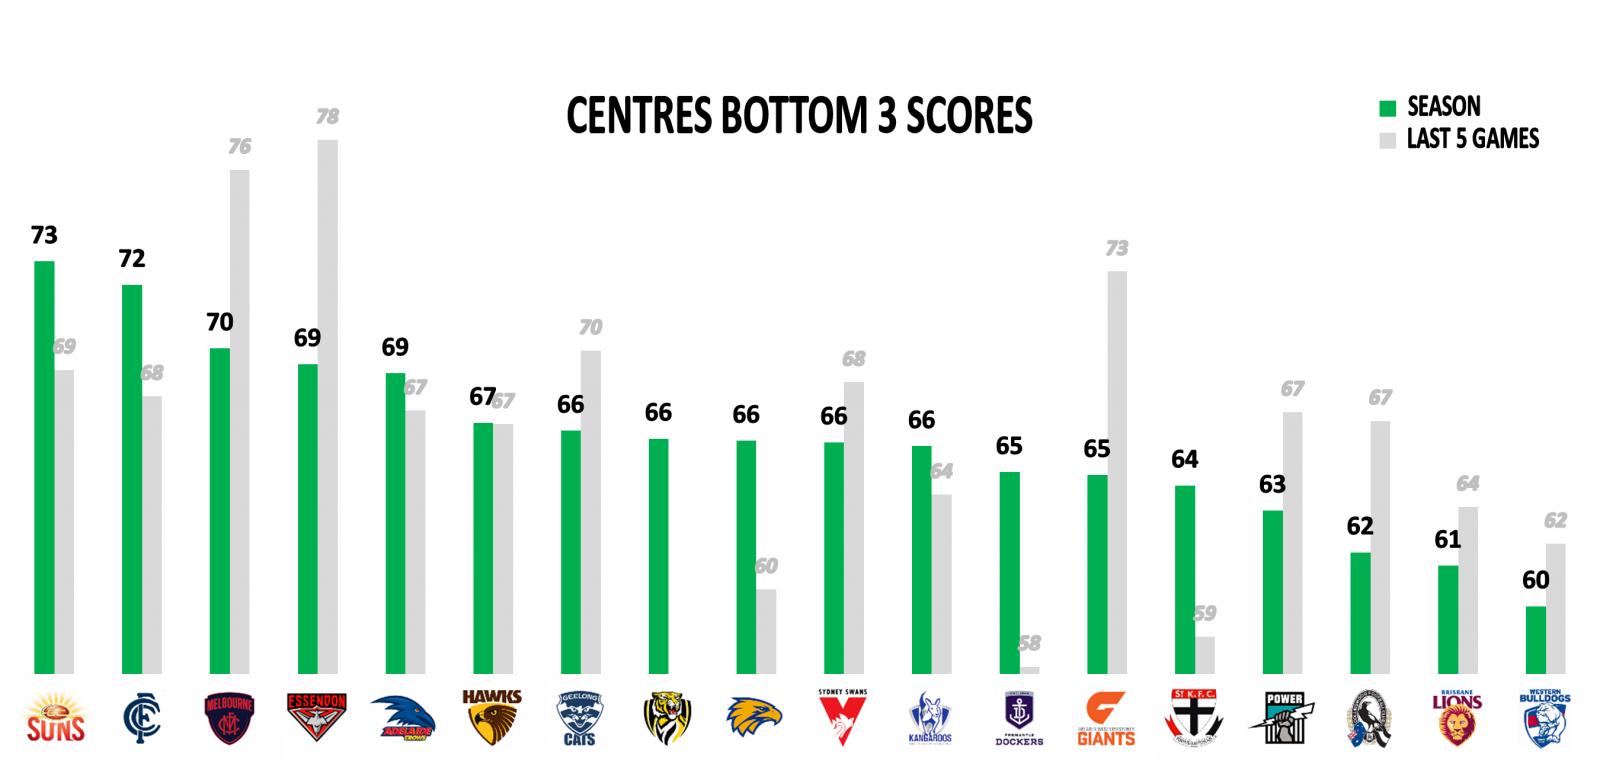 Centres points against